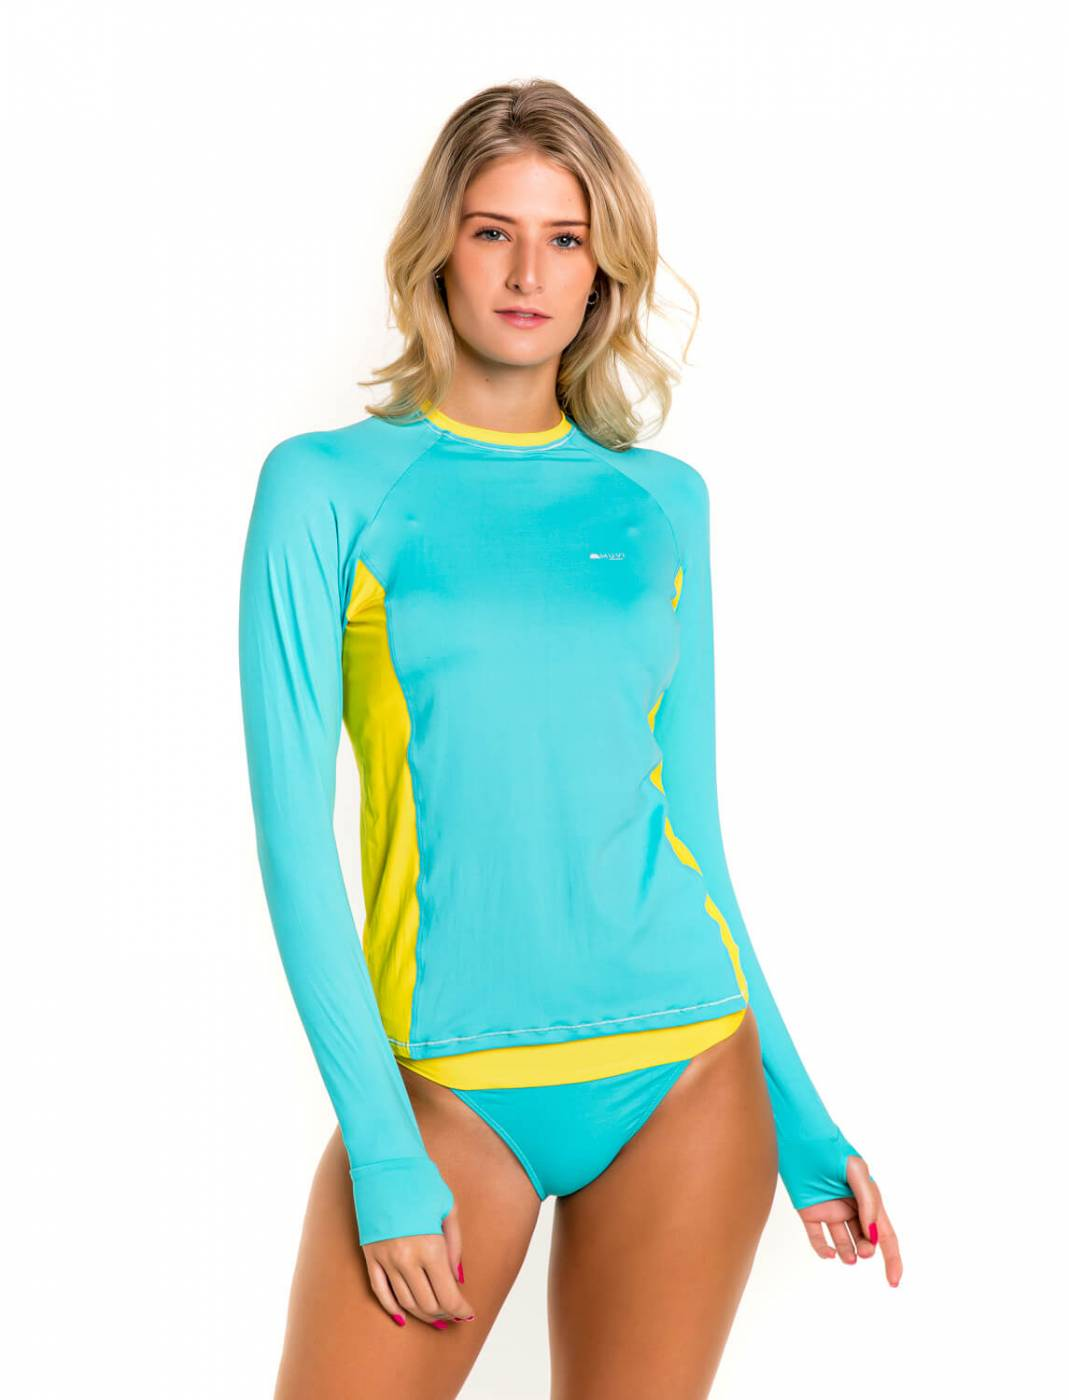 Camisa Feminina Slim Proteção Solar FPU50+ Muvi - Maldivas